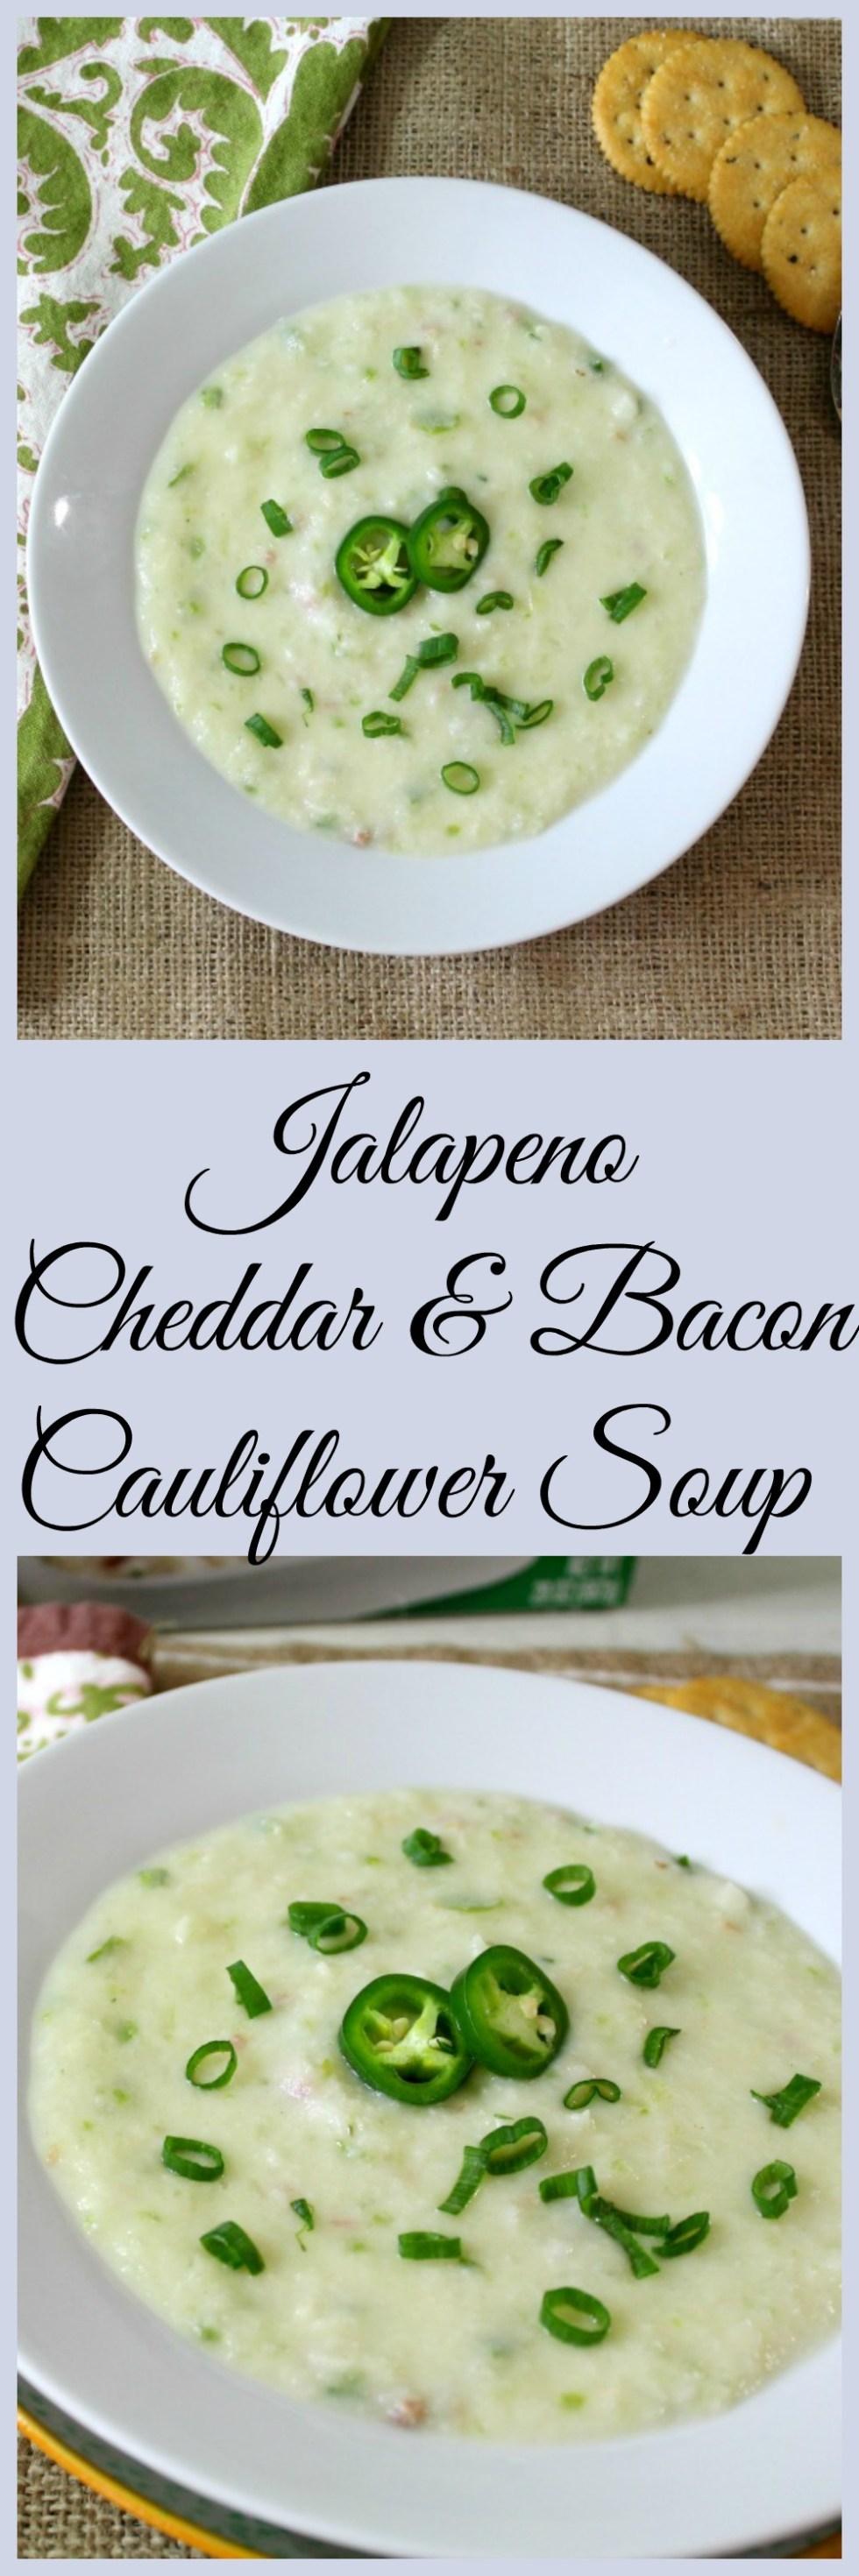 Jalapeno Cheddar & Bacon Cauliflower Soup